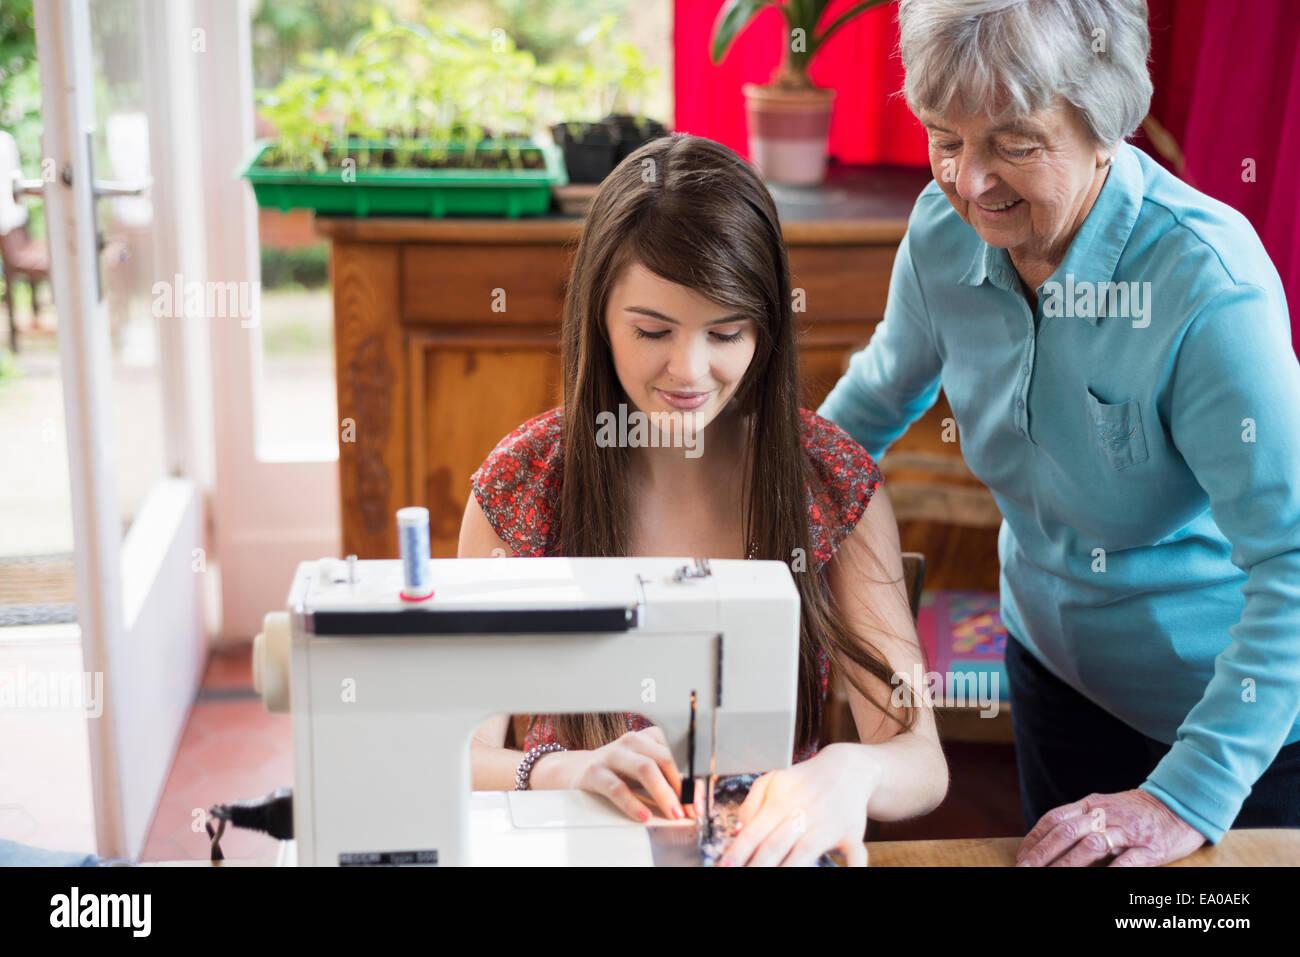 Ältere Frau beobachtete Enkelin Verwendung Nähmaschine Stockbild